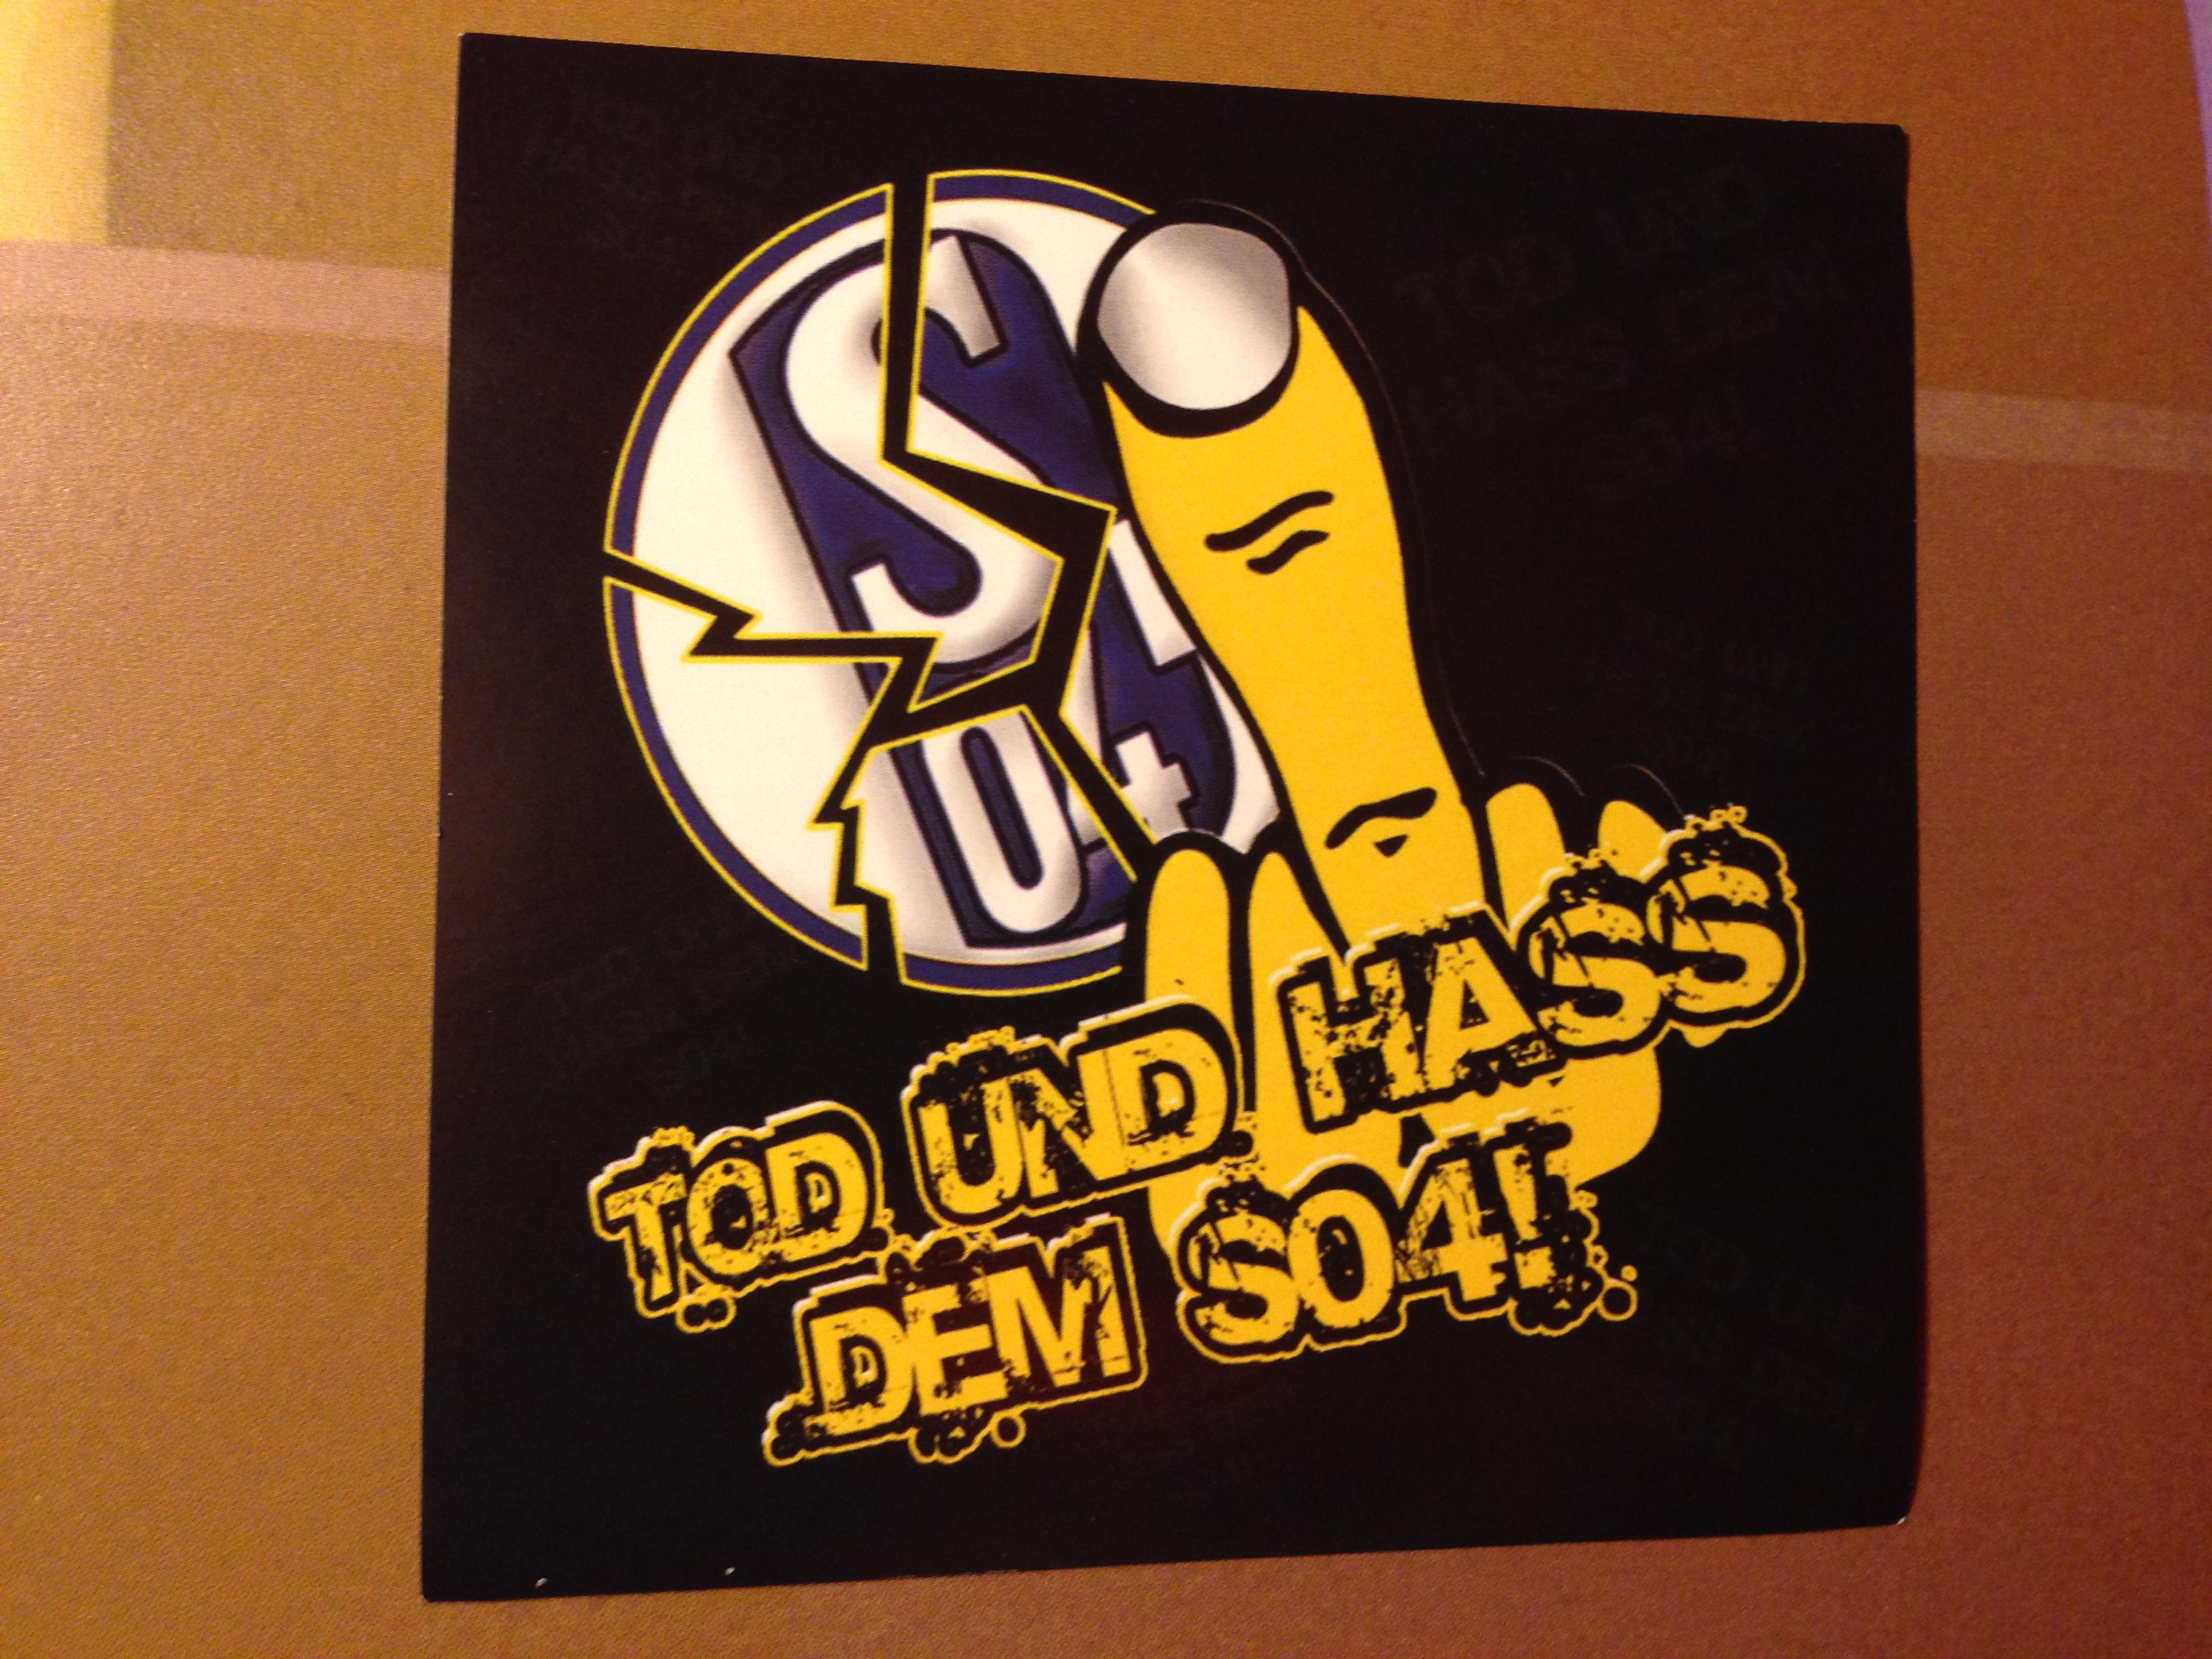 Dortmund Bvb Anti Schalke Ultrà Gallery